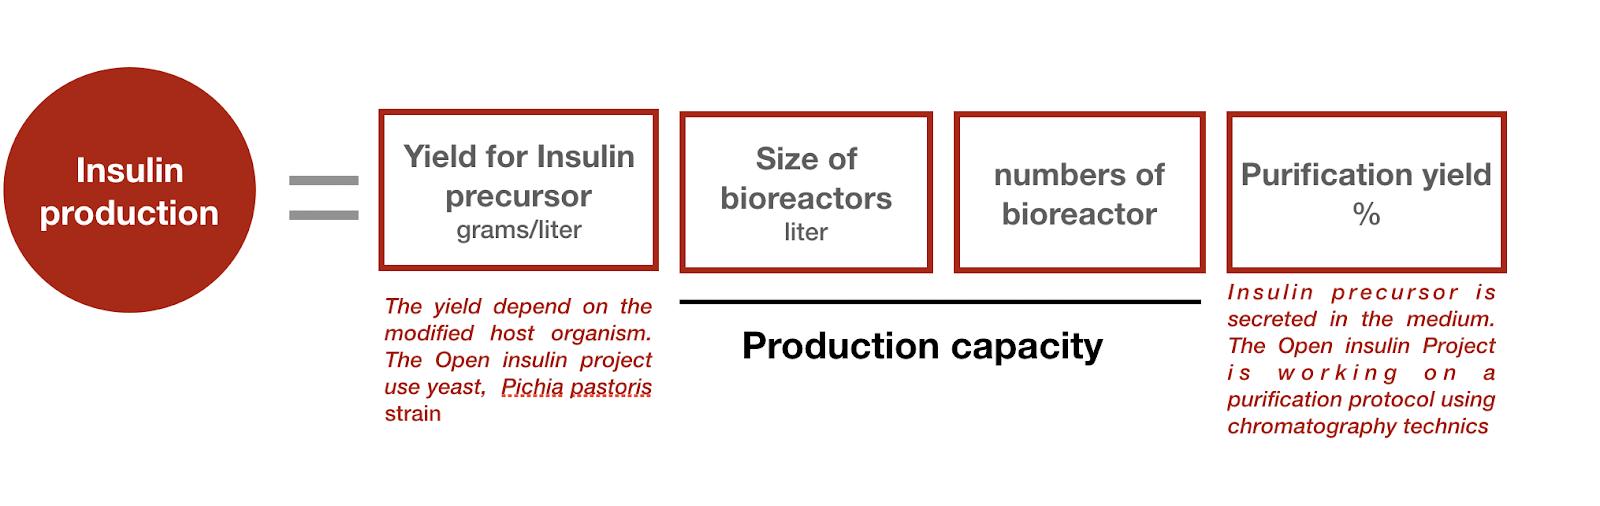 a diagram describing the below purification formula